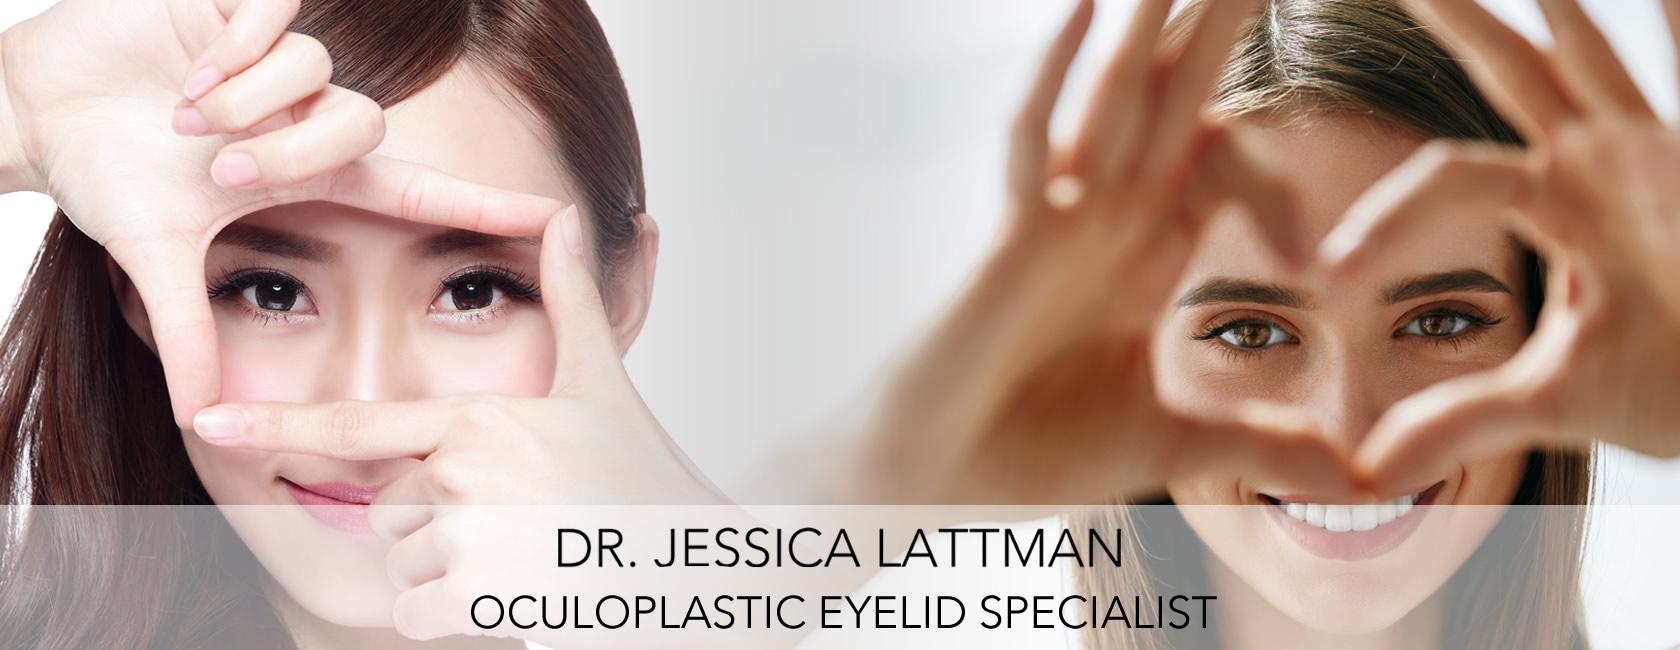 Dr  Jessica Lattman | Oculoplastic Eyelid Surgeon NYC